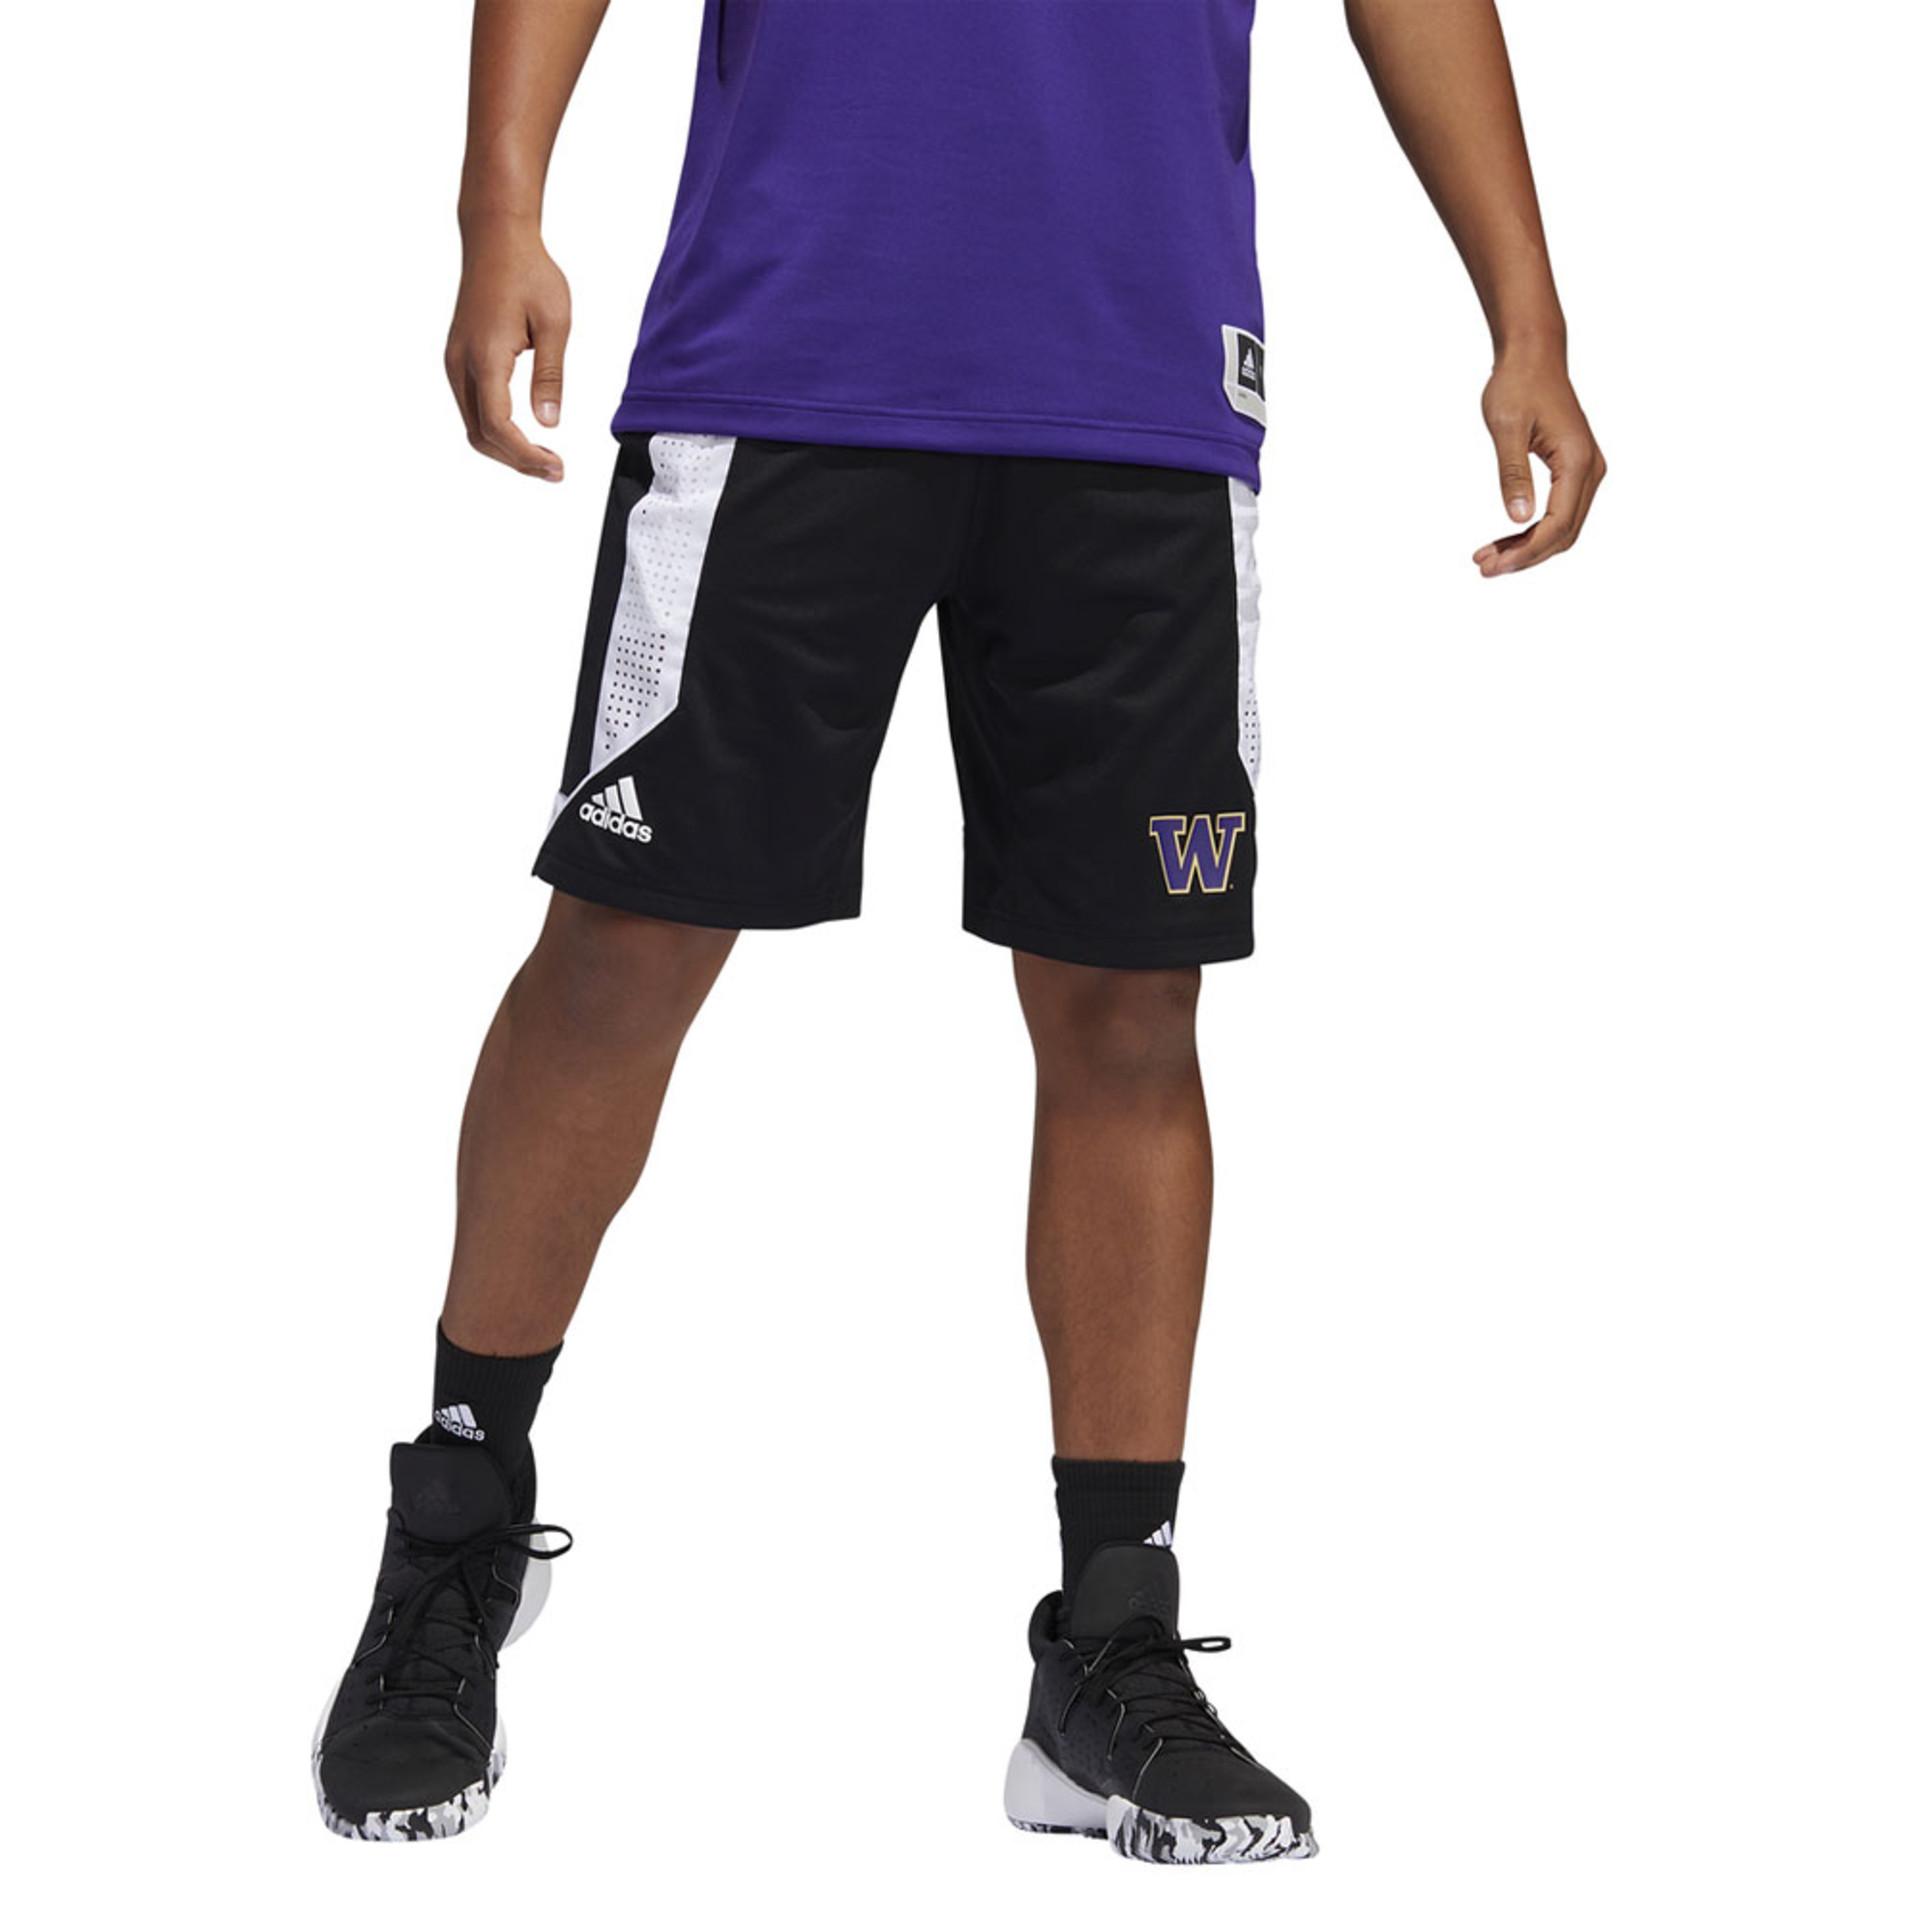 adidas Men's W Swingman Basketball Shorts – On Model